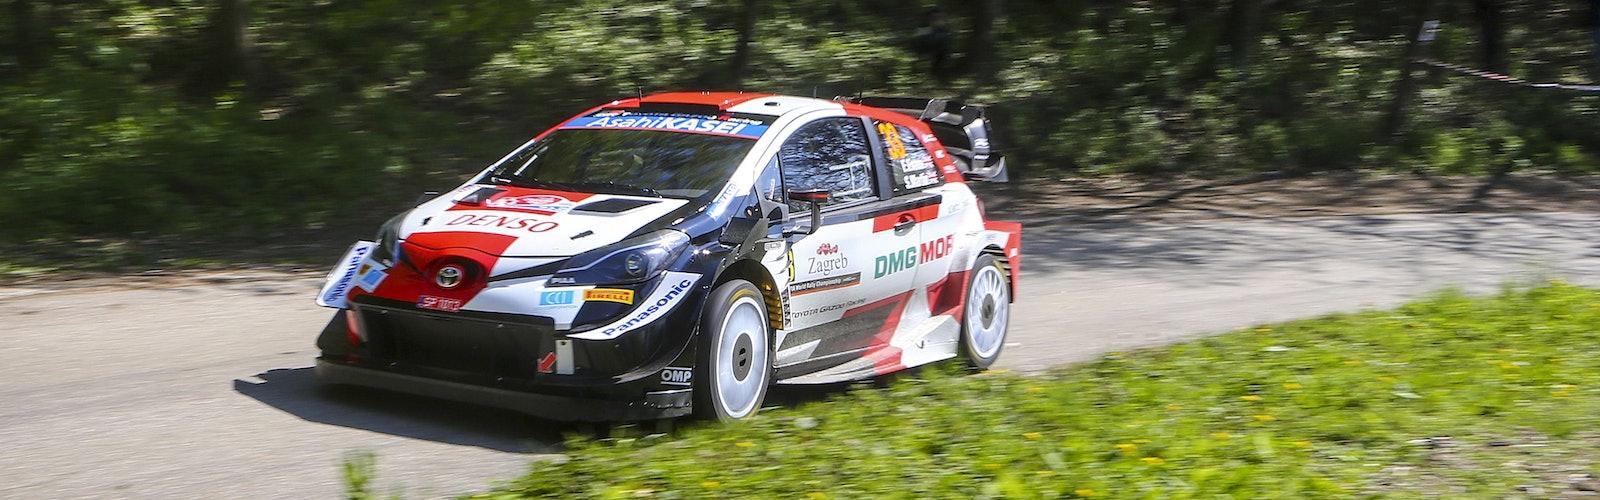 WRC_2021_Rd.3_133